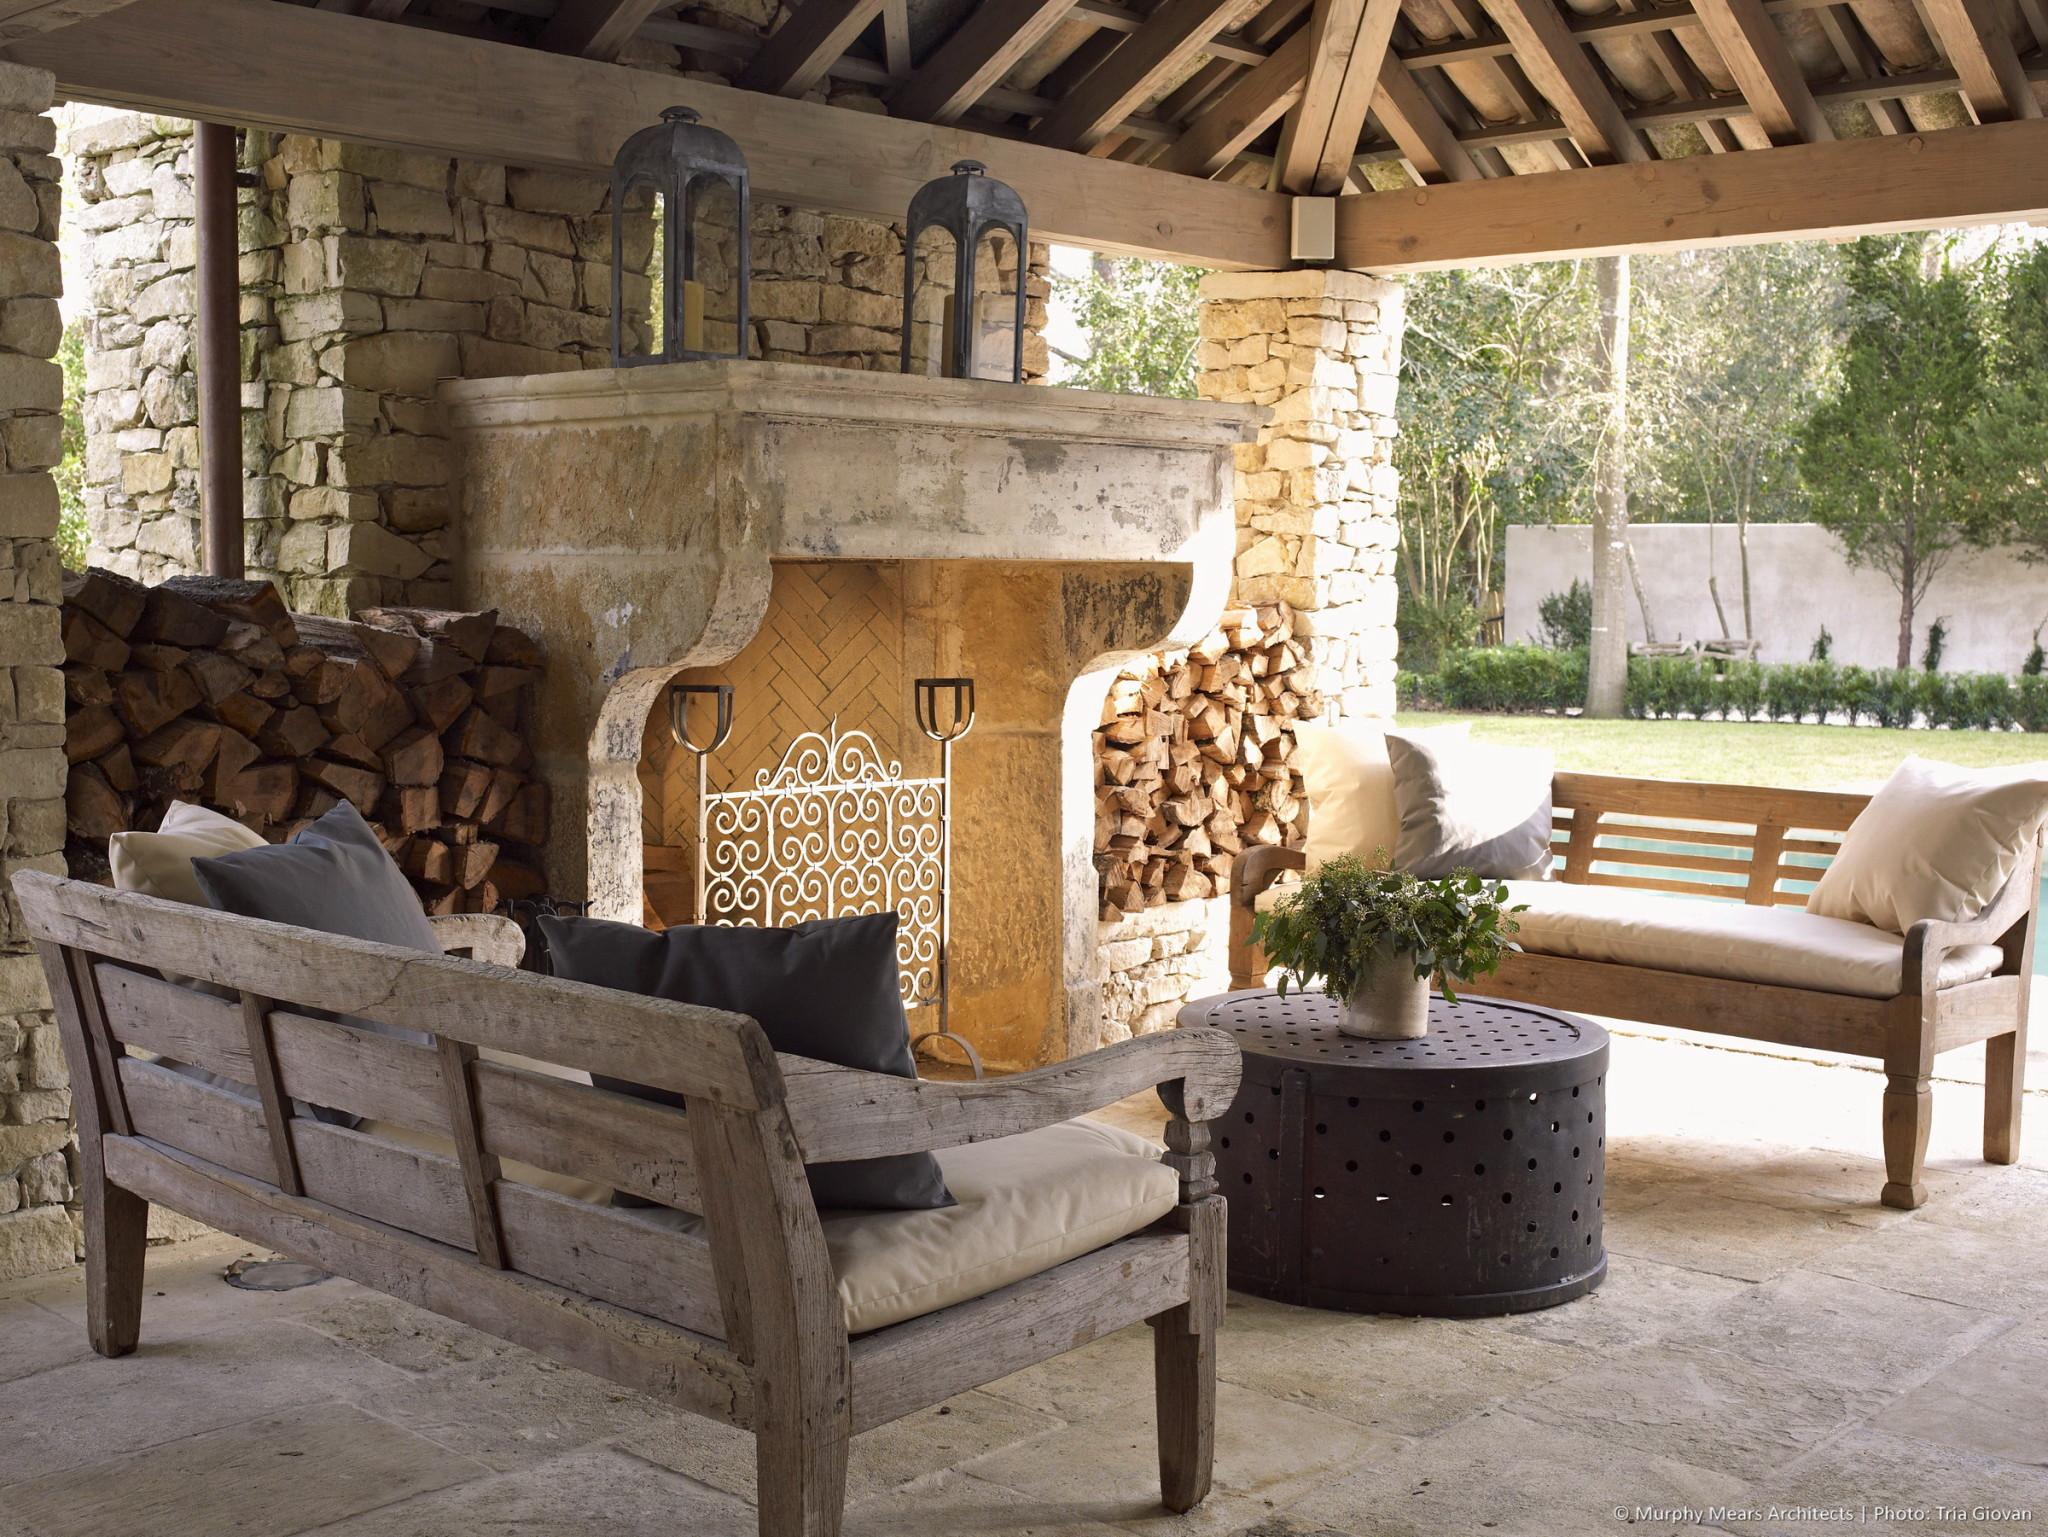 w-bridge-house-exterior-seating